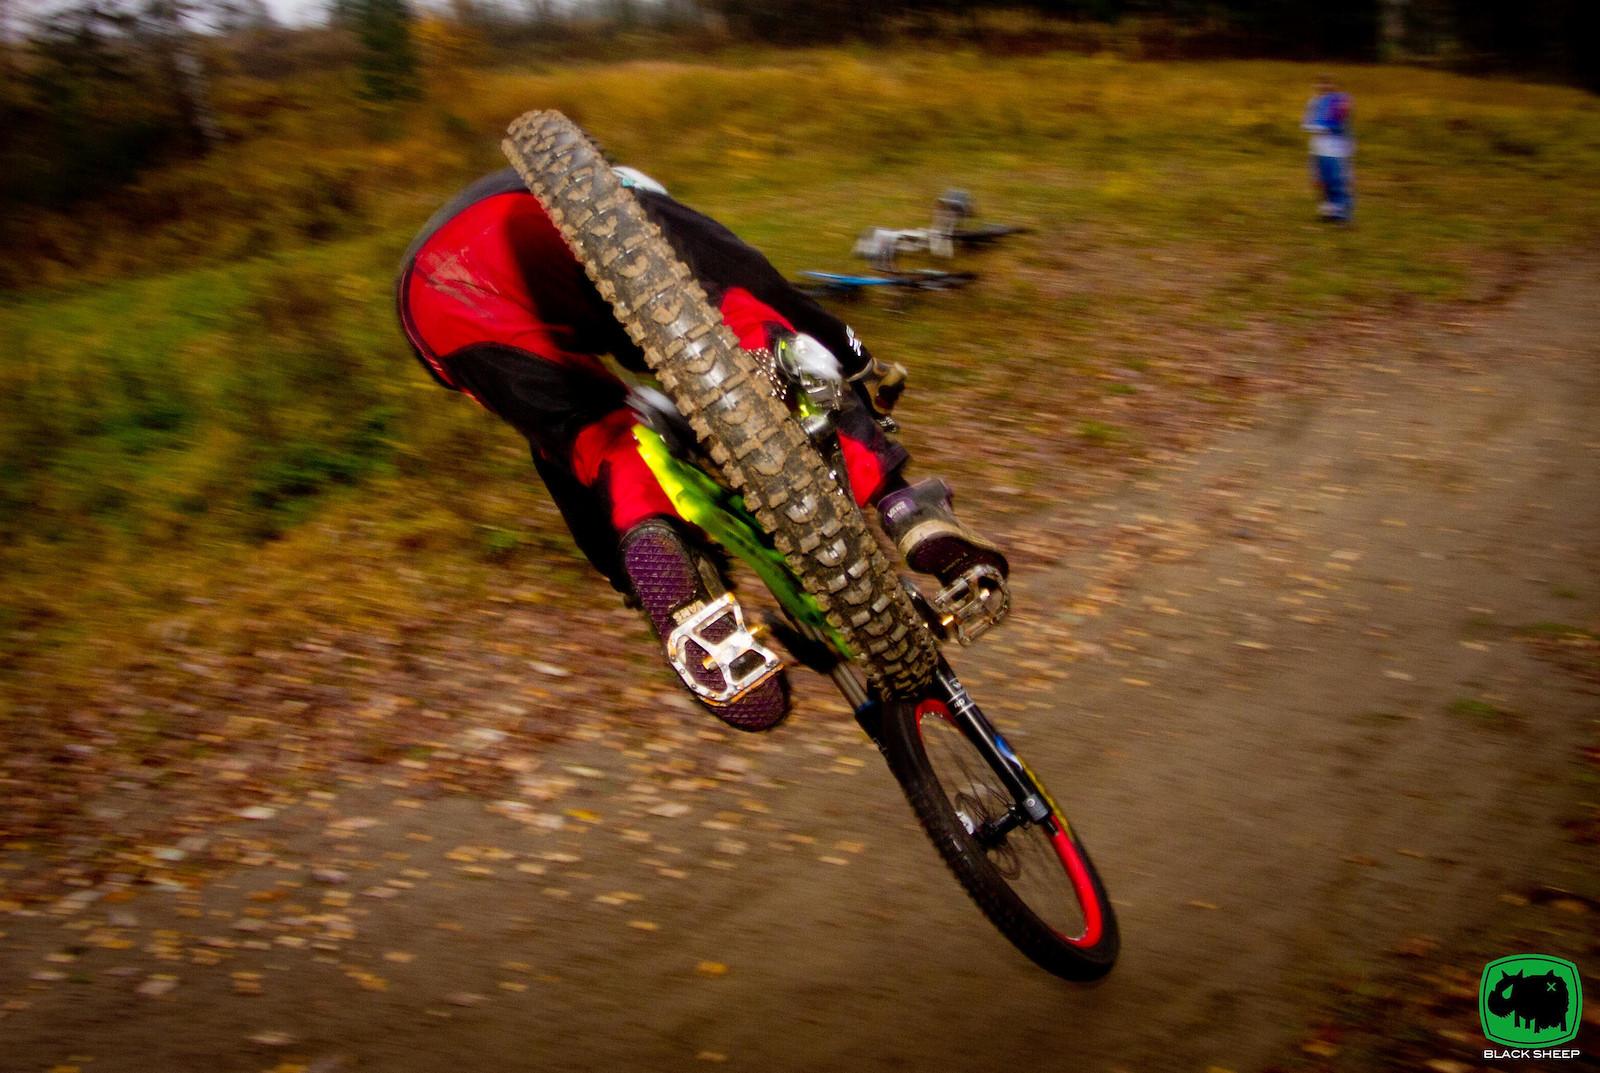 touch down  - blacksheepdesignfinland - Mountain Biking Pictures - Vital MTB